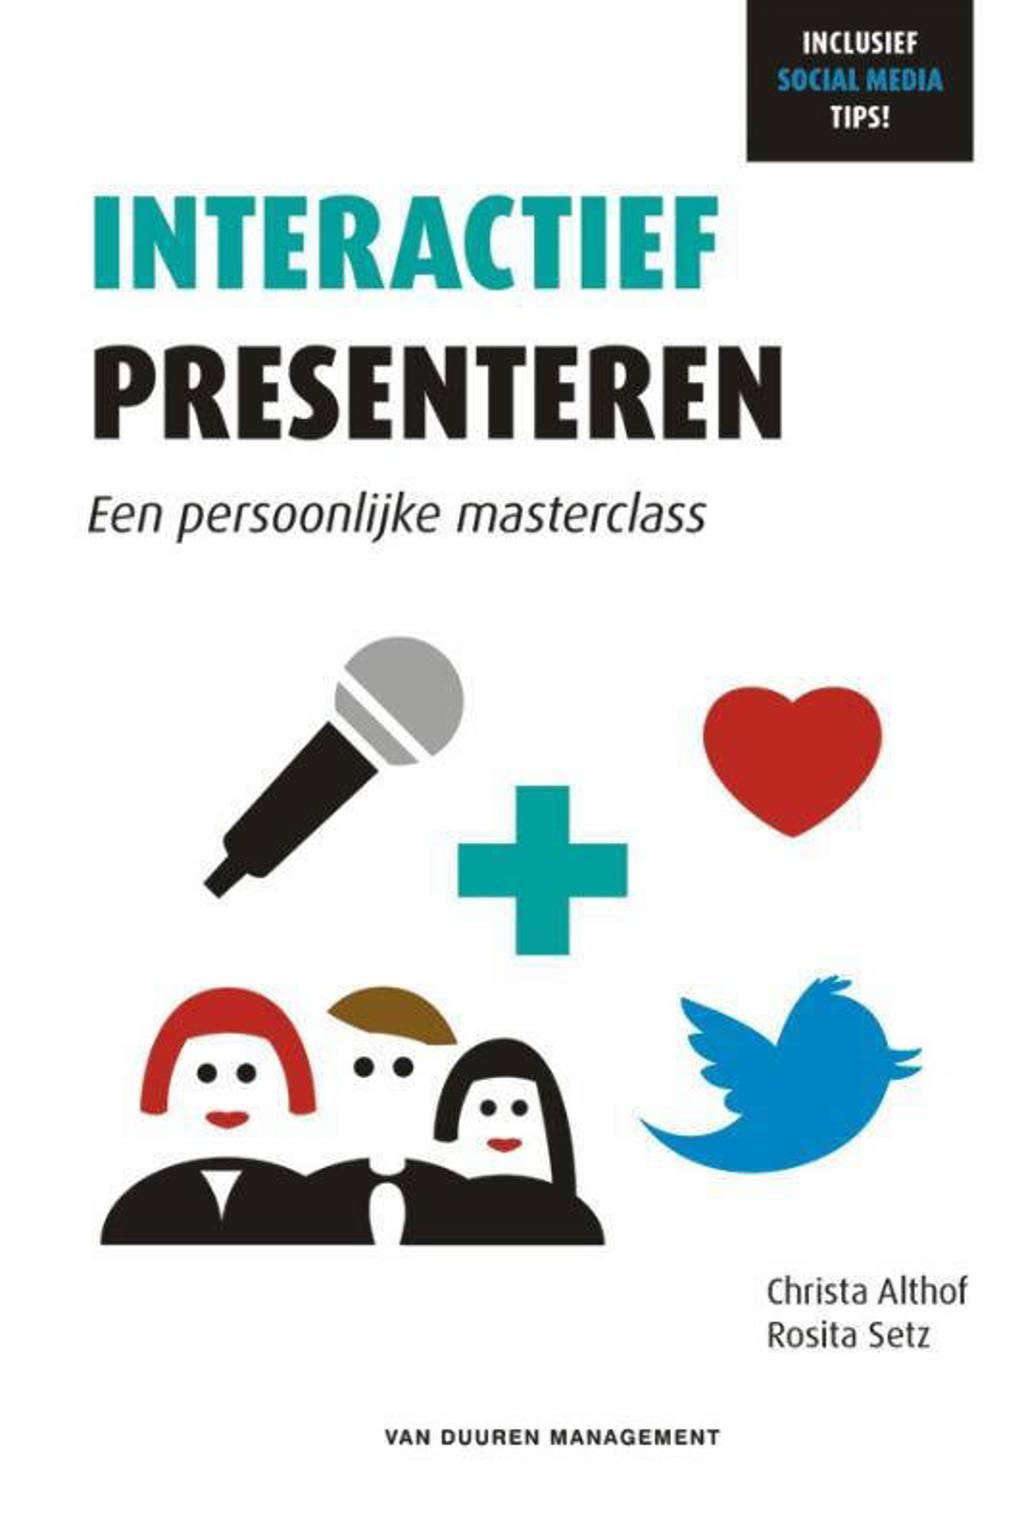 Interactief presenteren - Christa Althof en Rosita Setz